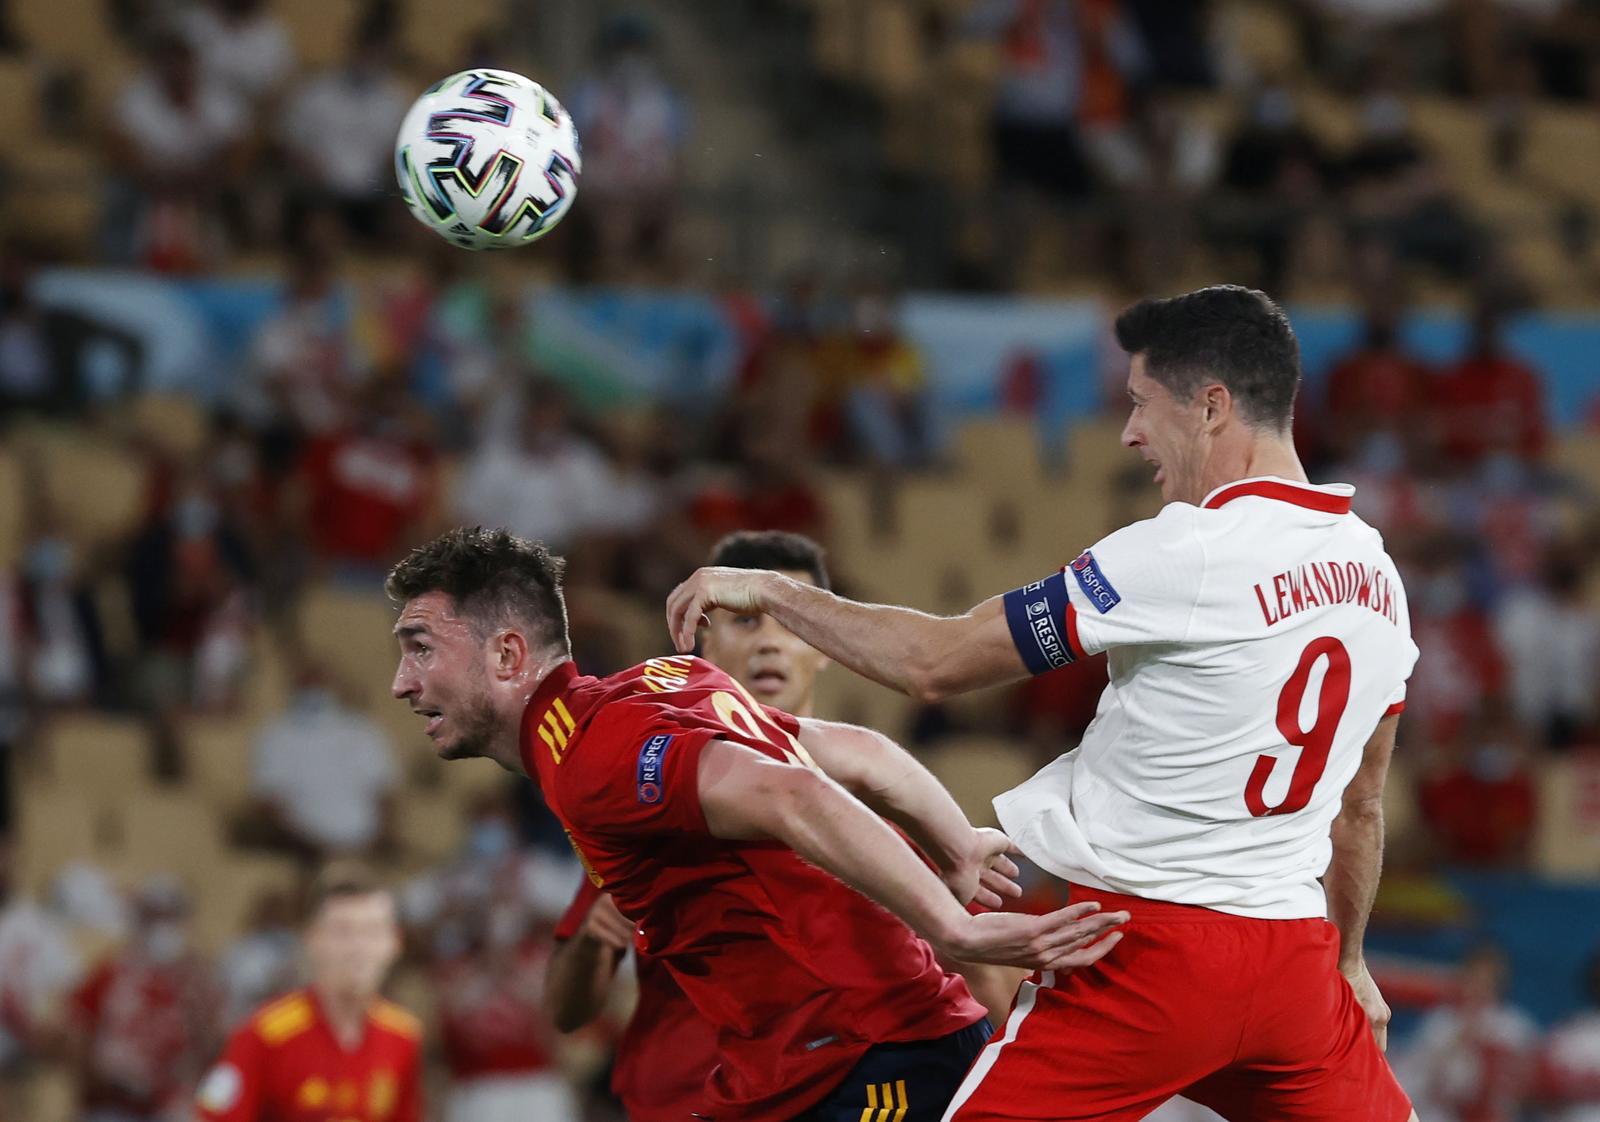 Soccer Football - Euro 2020 - Group E - Spain v Poland - La Cartuja Stadium, Seville, Spain - June 19, 2021 Poland's Robert Lewandowski scores their first goal. Photo: Pool via Reuters